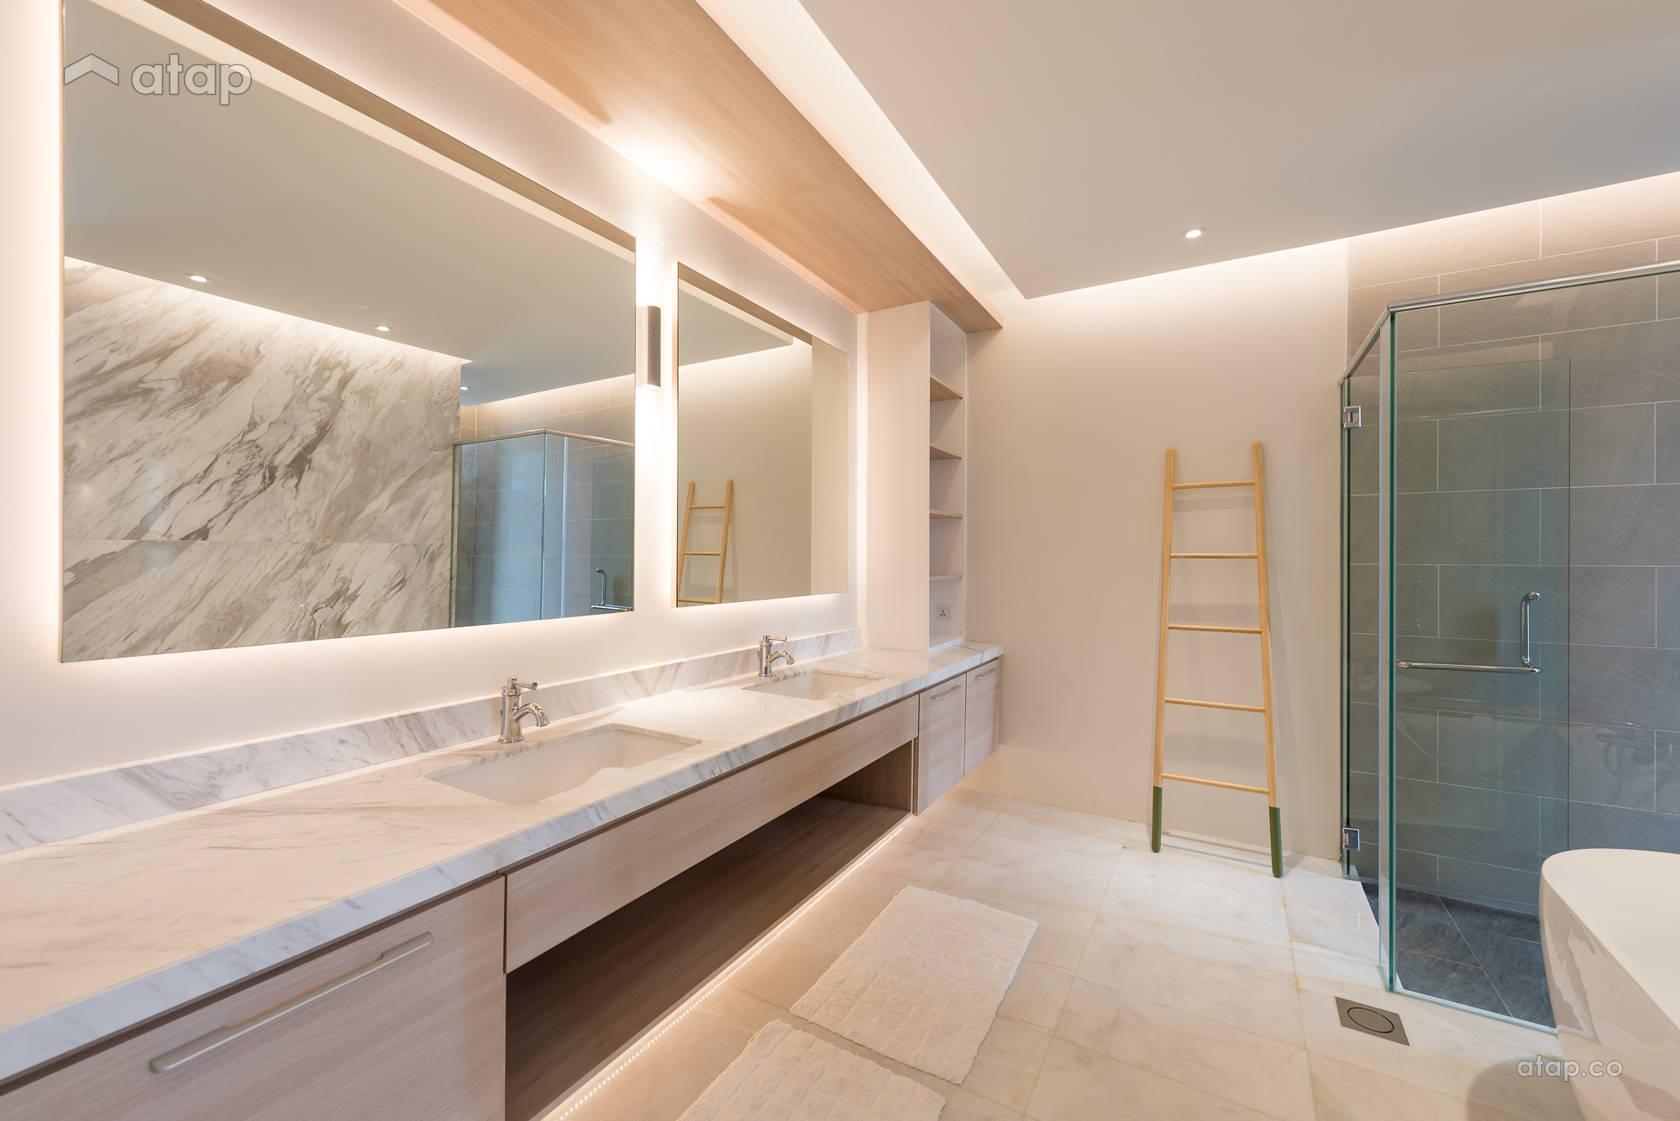 Scandinavian Bungalow When Simplicity Matters Asian Bathroom Design Ideas Photos Malaysia Atap Co